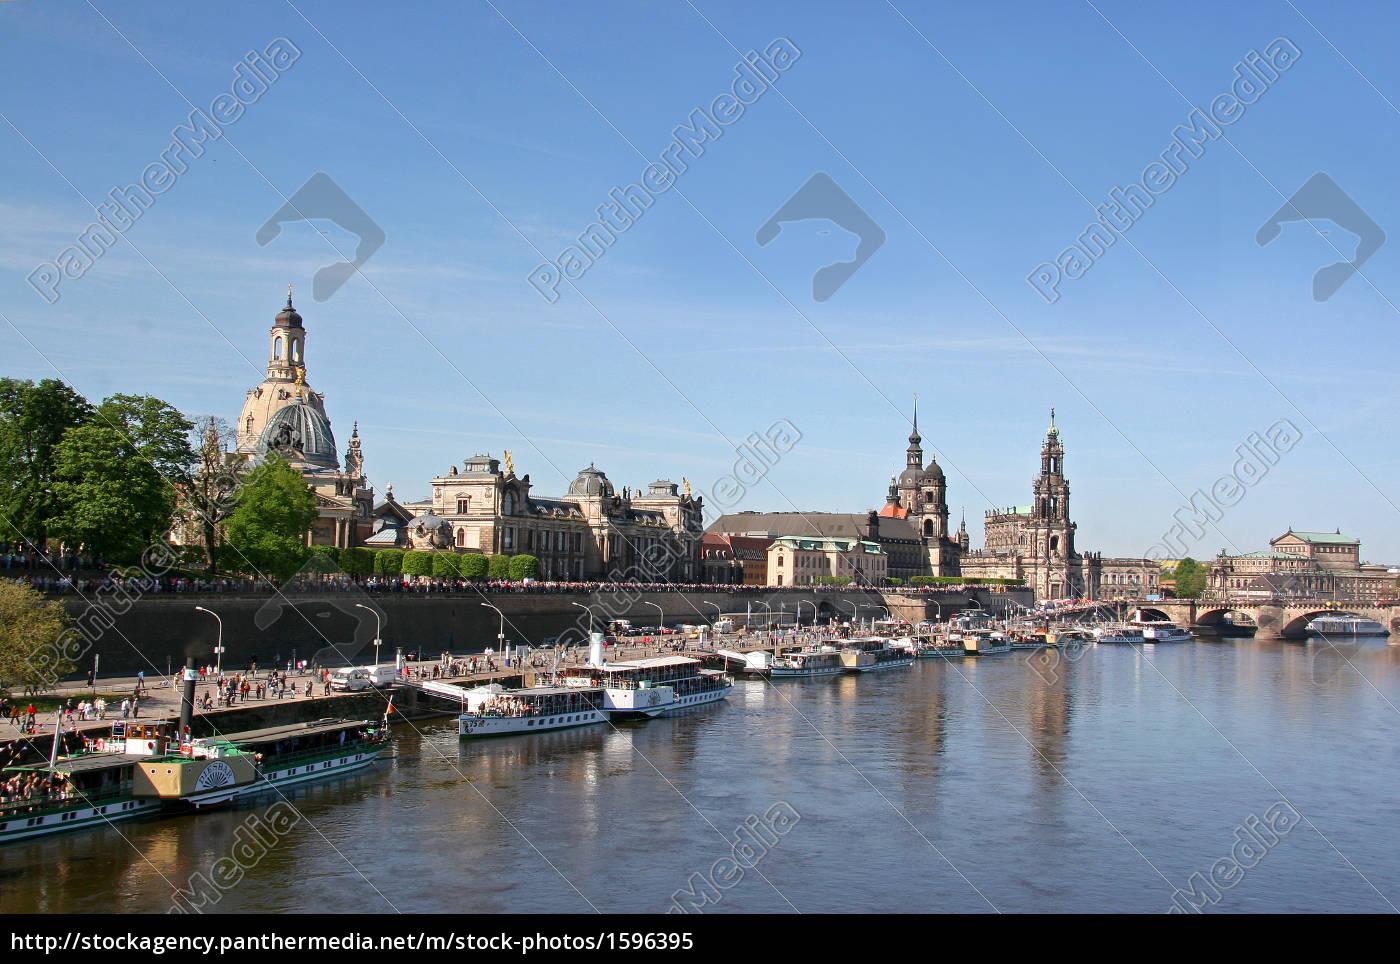 historic, dresden - 1596395